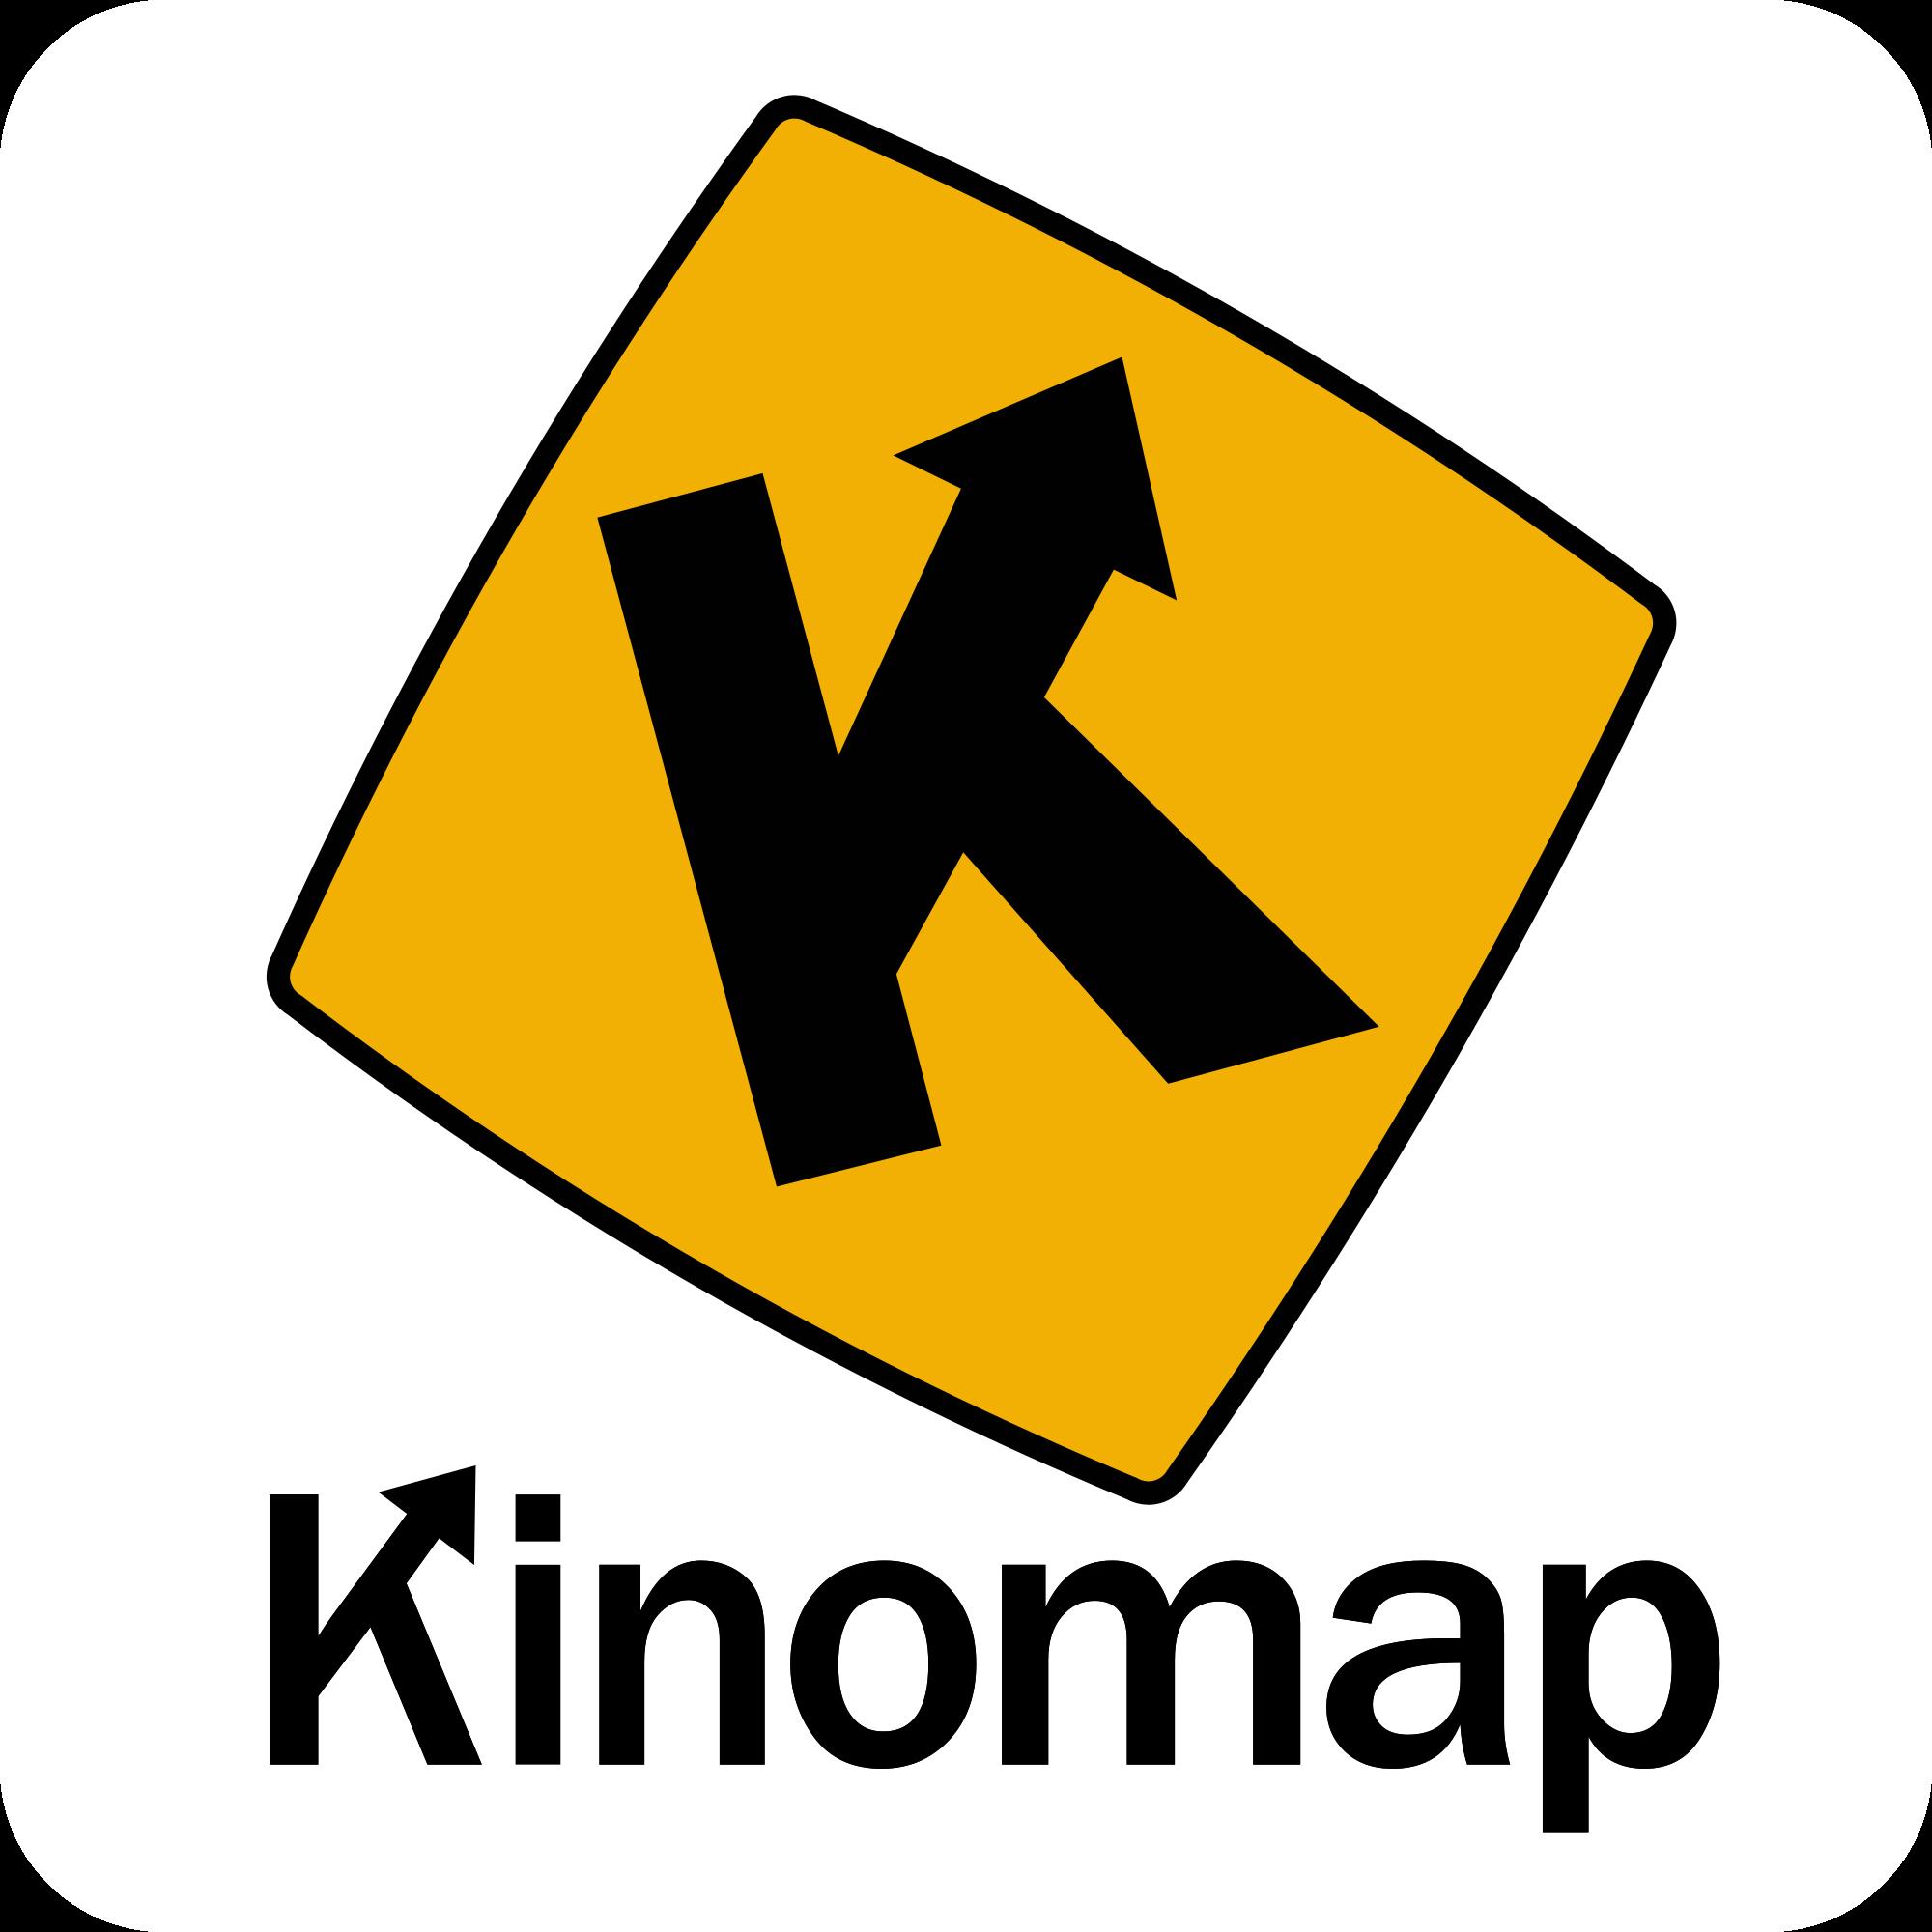 Kinomap_square_color_full.png